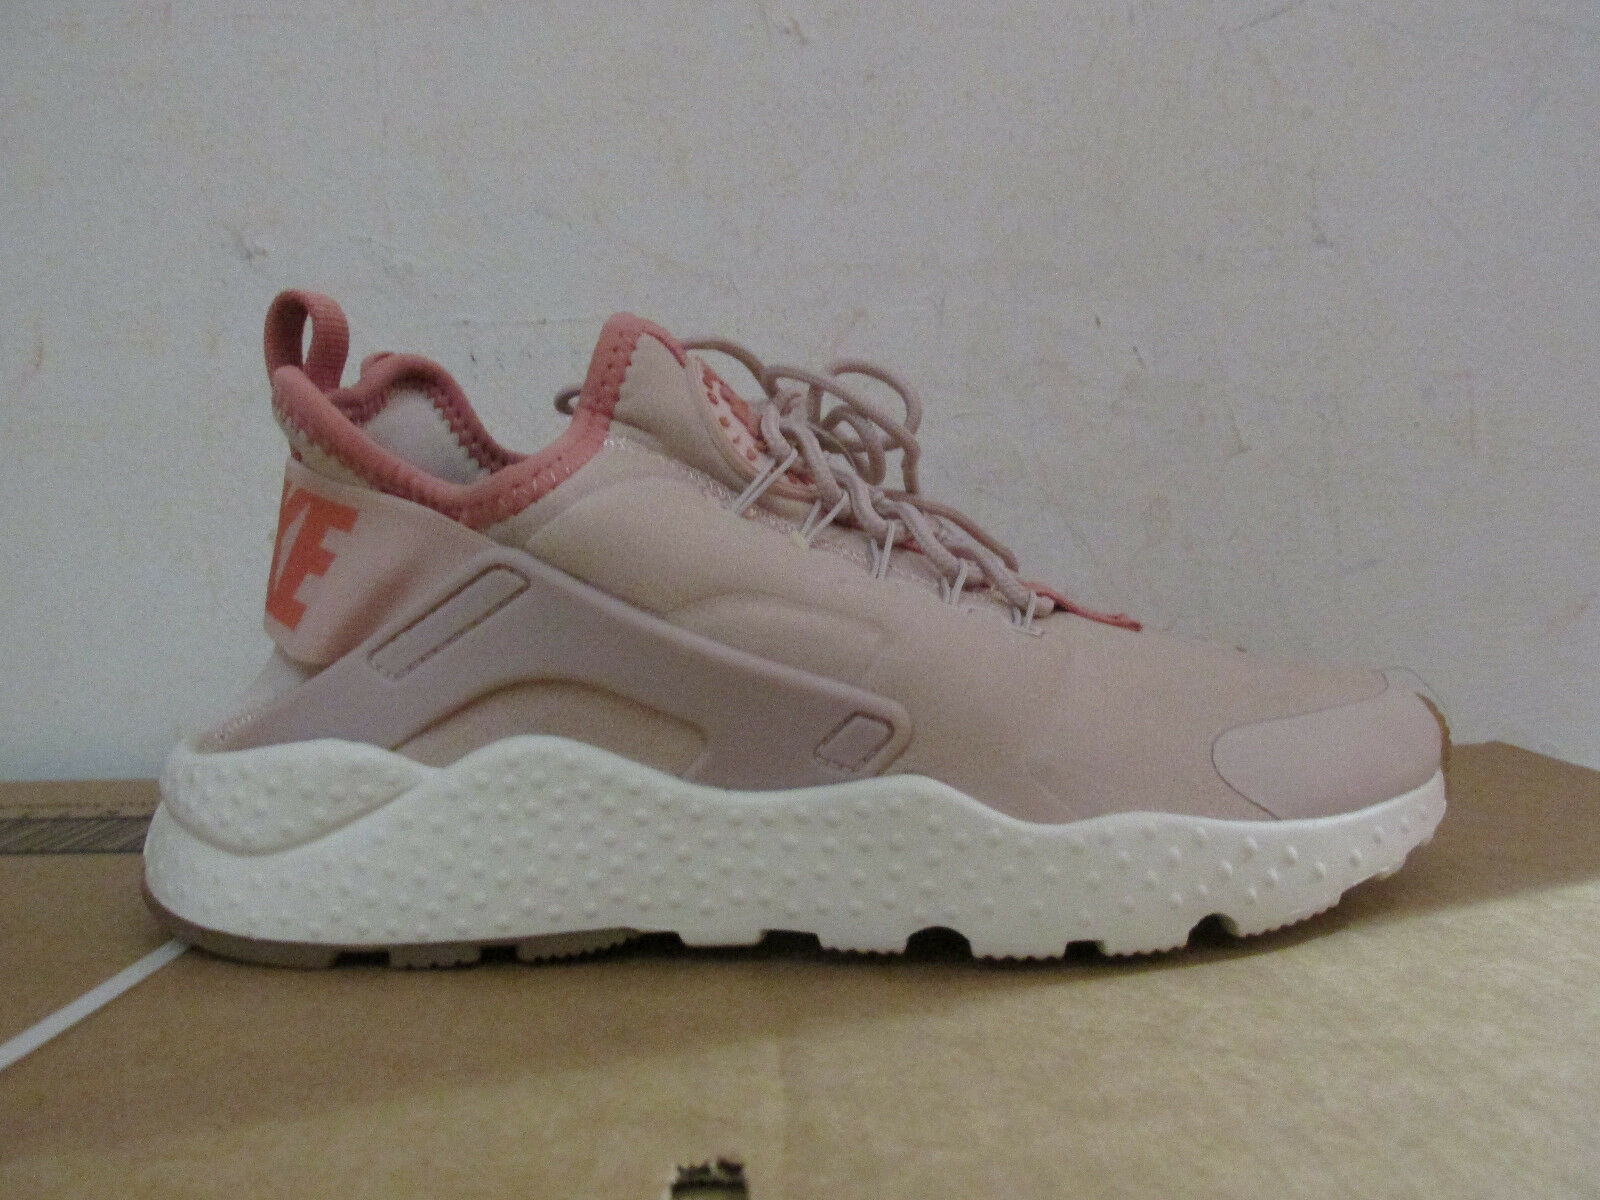 Nike air huarache ultra womens 859511 601 trainers sneakers shoes SAMPLE